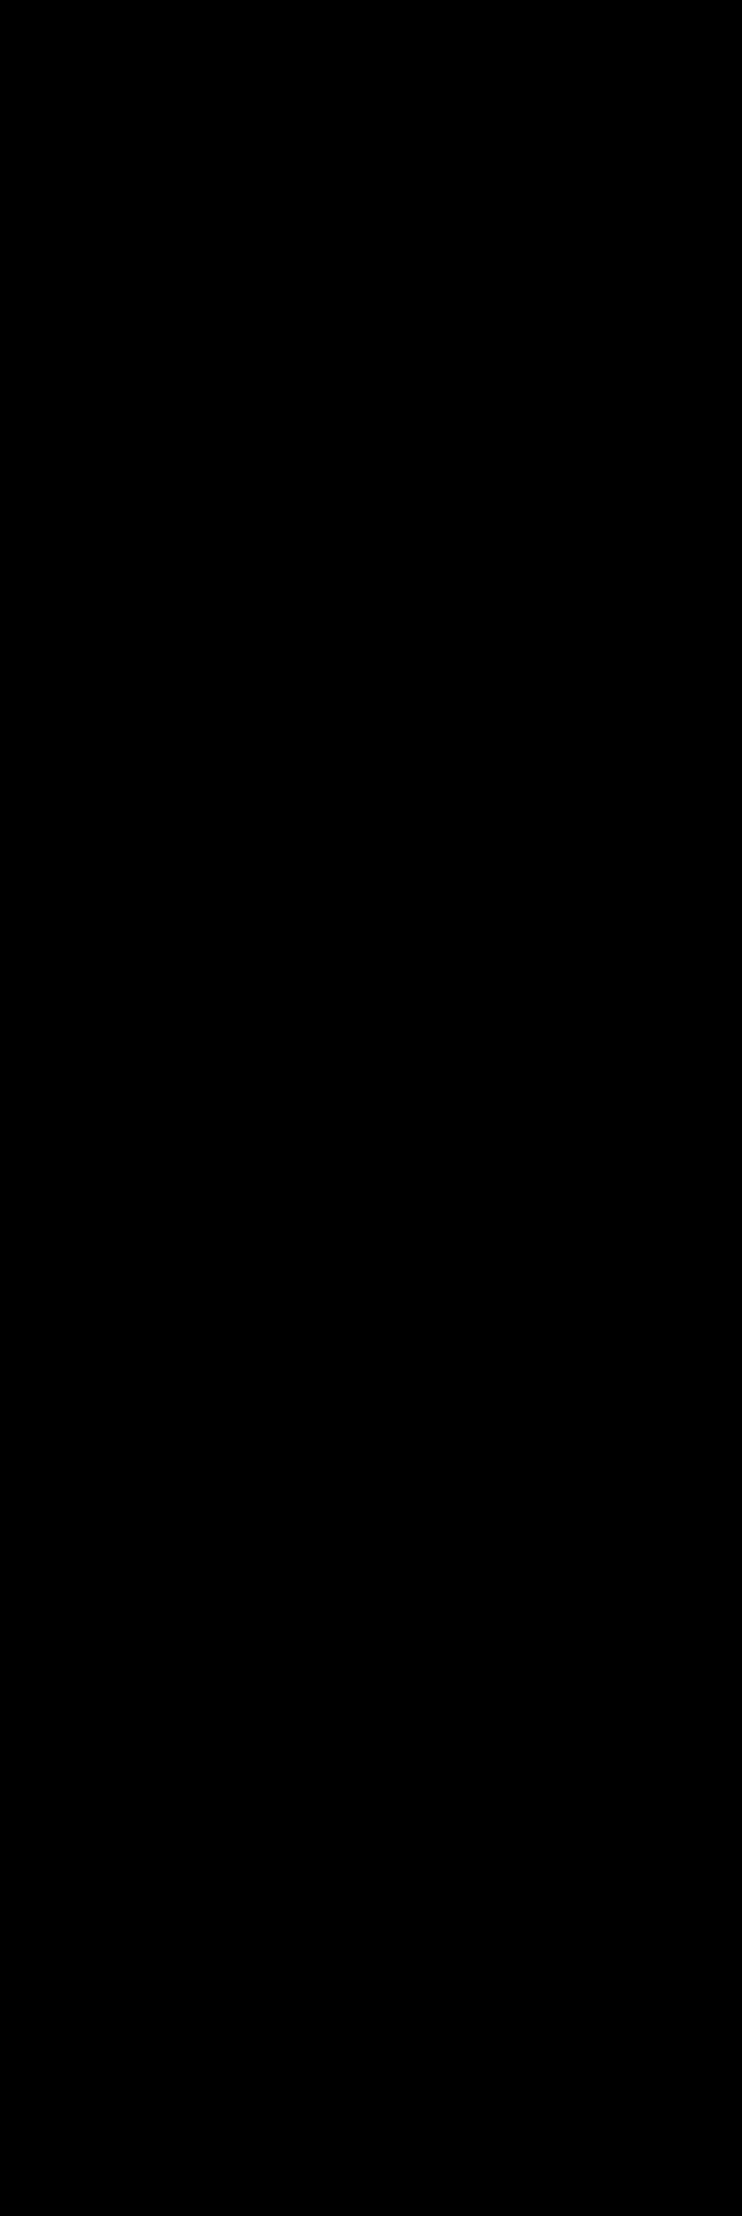 silhouette guitar at getdrawings com free for personal use rh getdrawings com electric guitar silhouette clip art